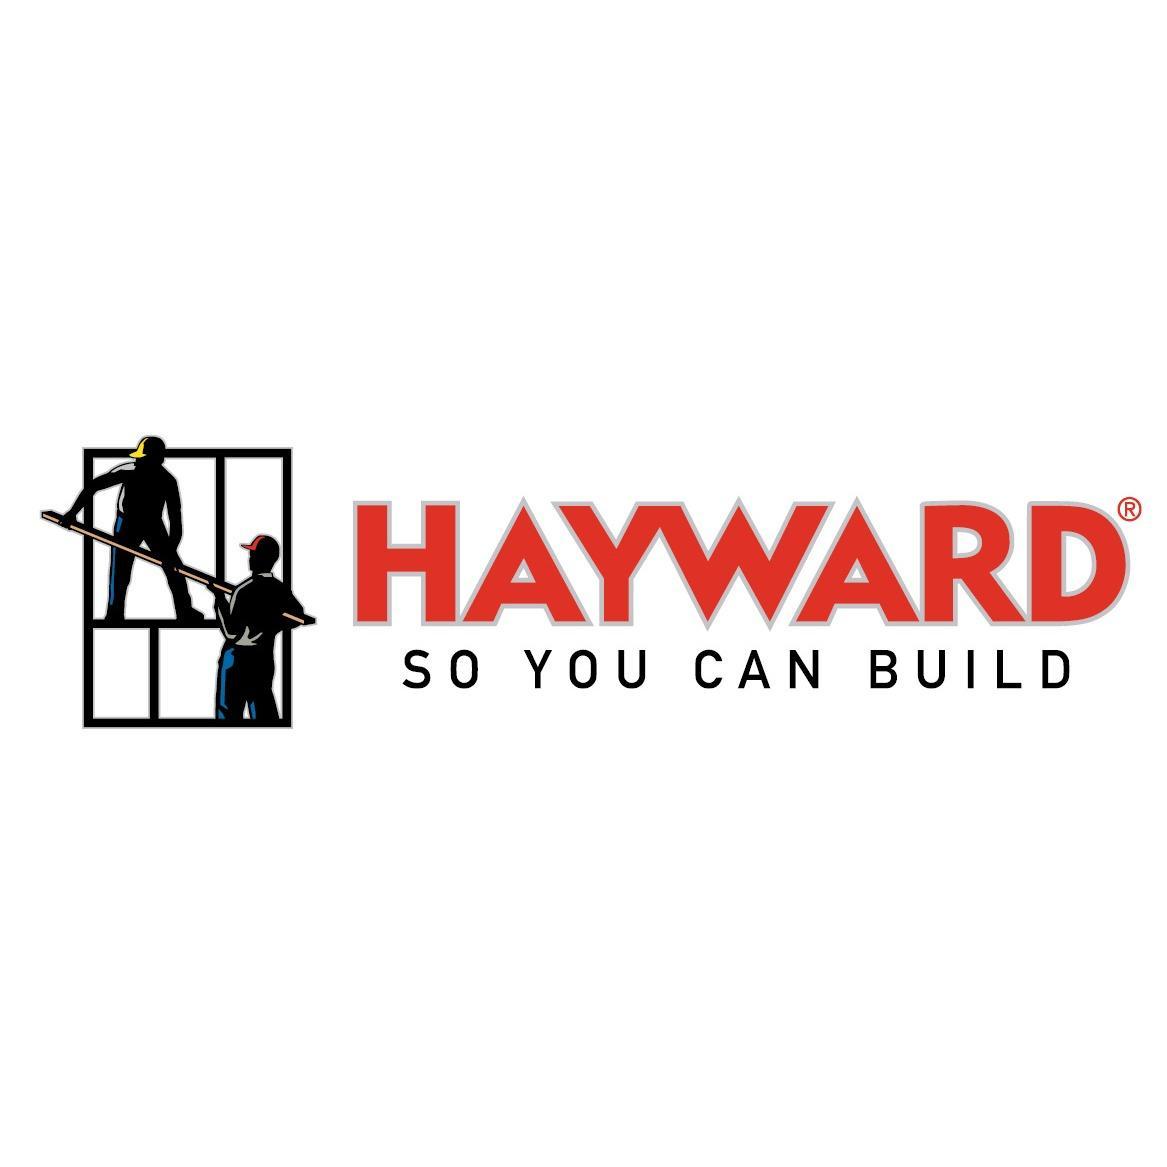 Hayward Lumber - Goleta - Goleta, CA - Lumber Supply